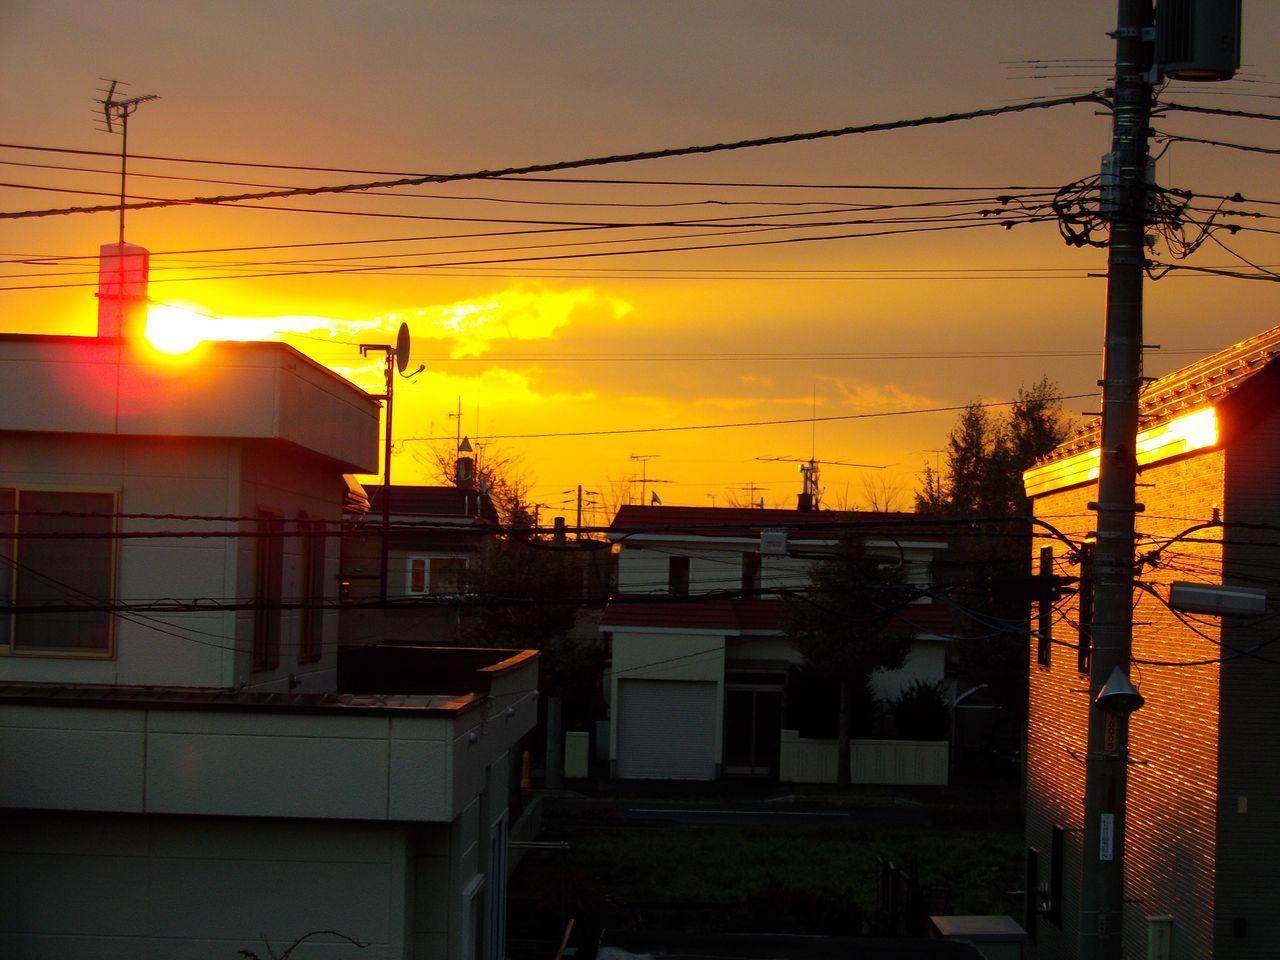 嵐去り_c0025115_17282192.jpg